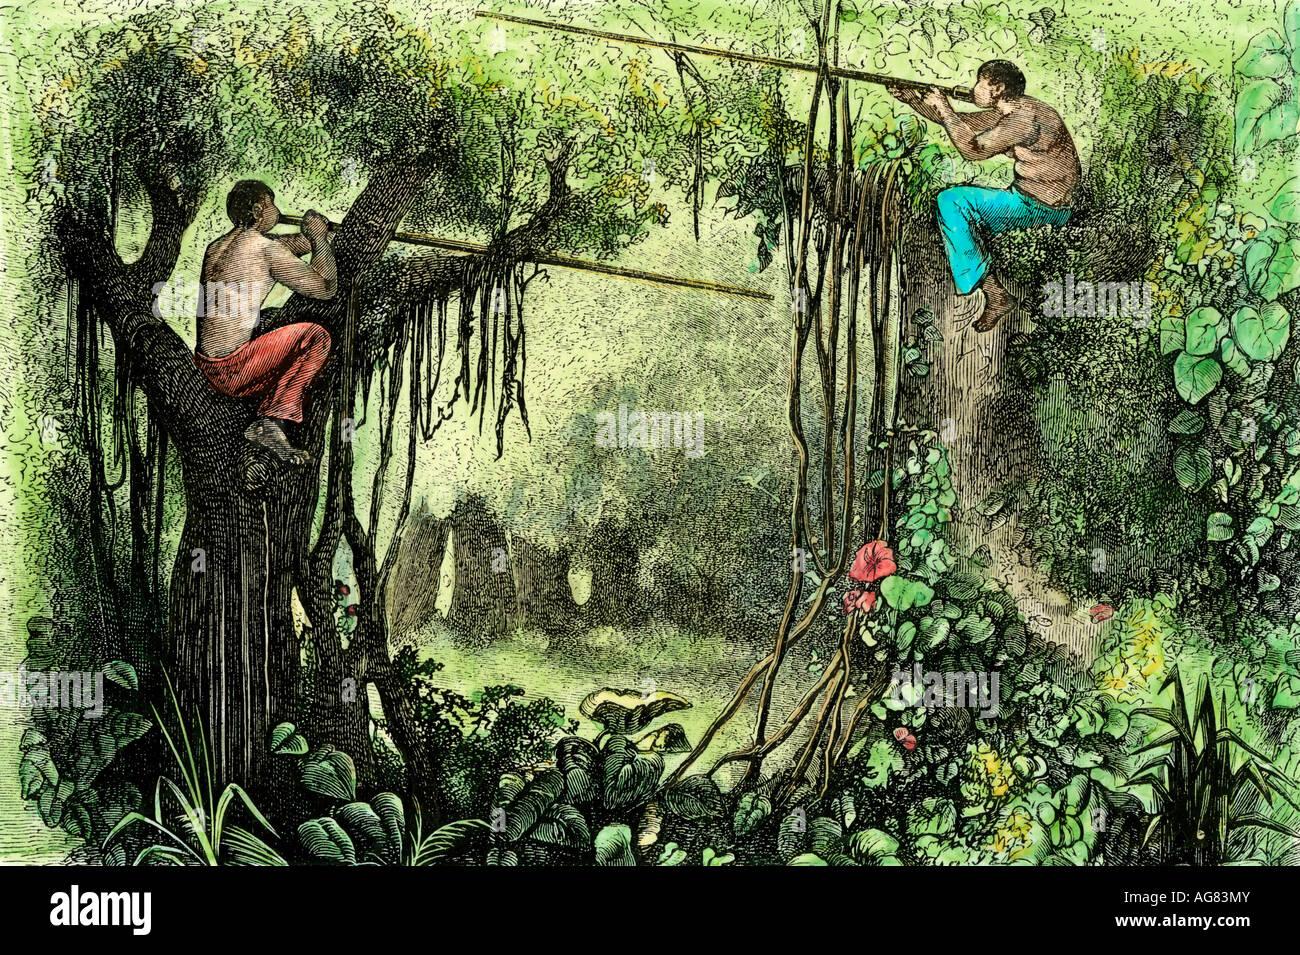 Brazillian natives hunting with poison blow guns Amazon basin - Stock Image f120b0f652377